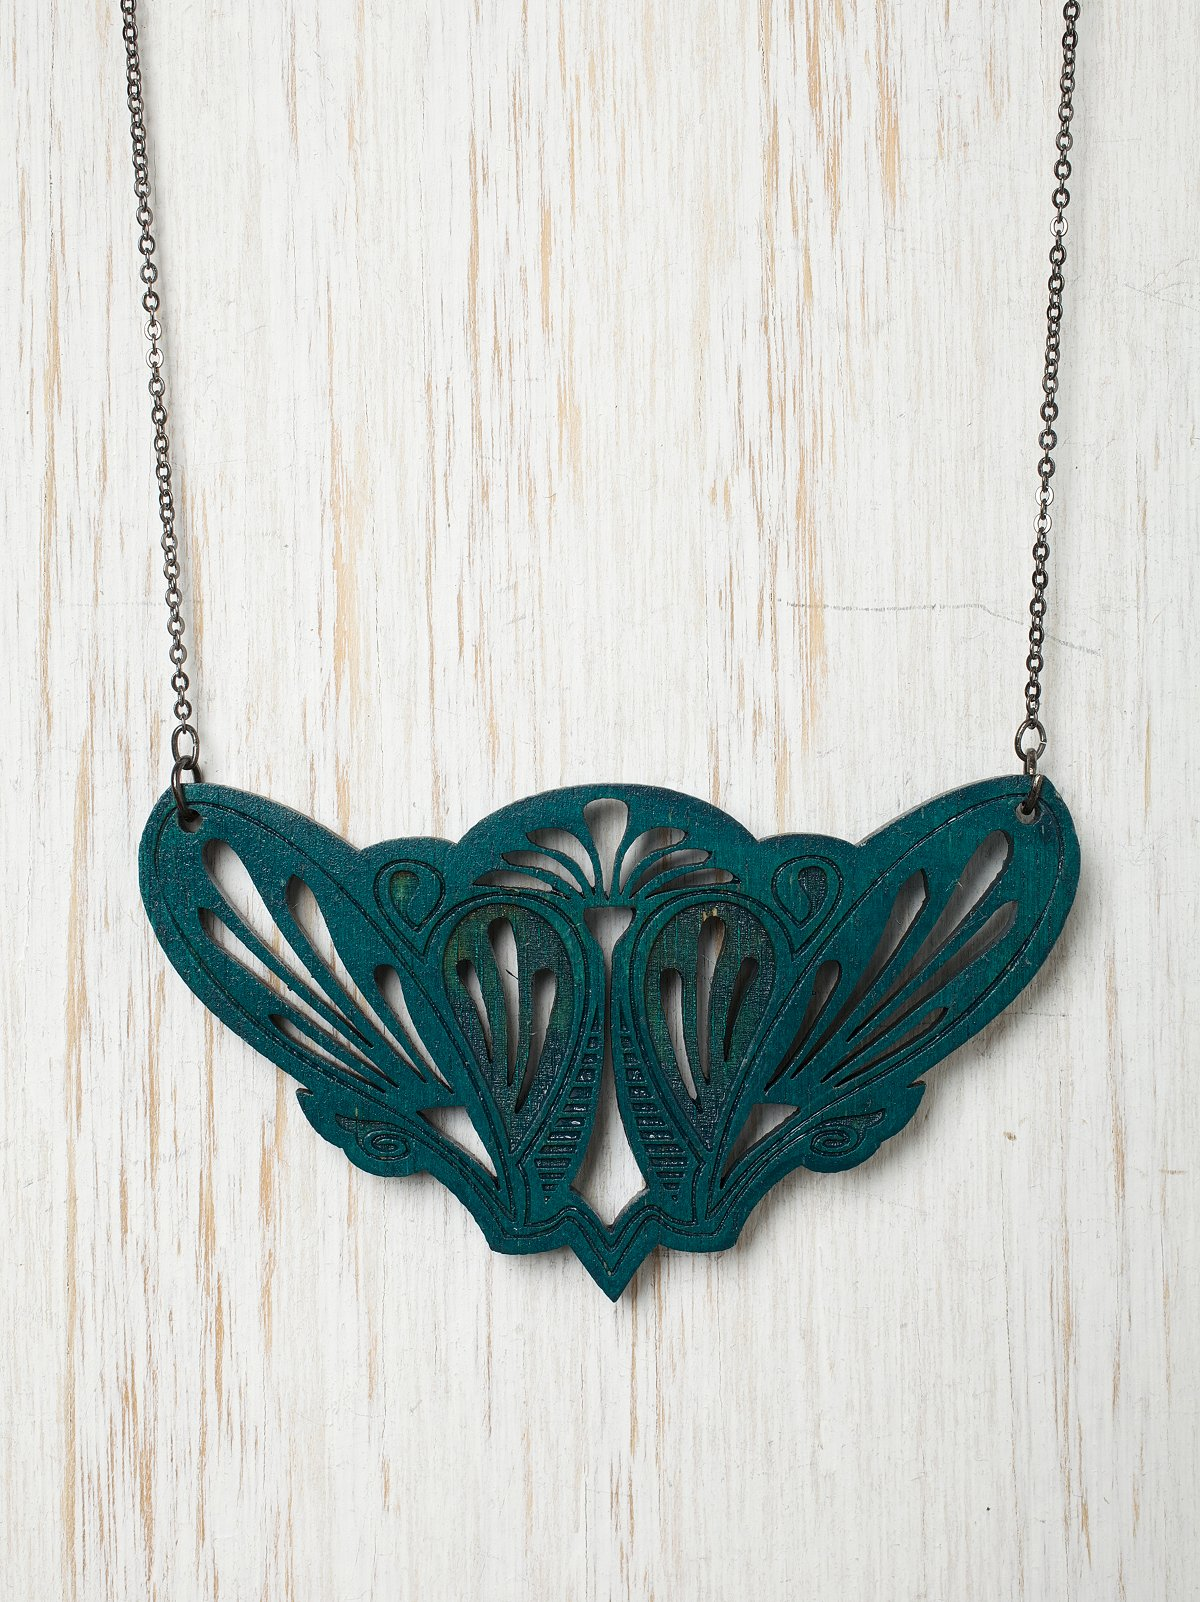 Artemis Cut Wood Necklace